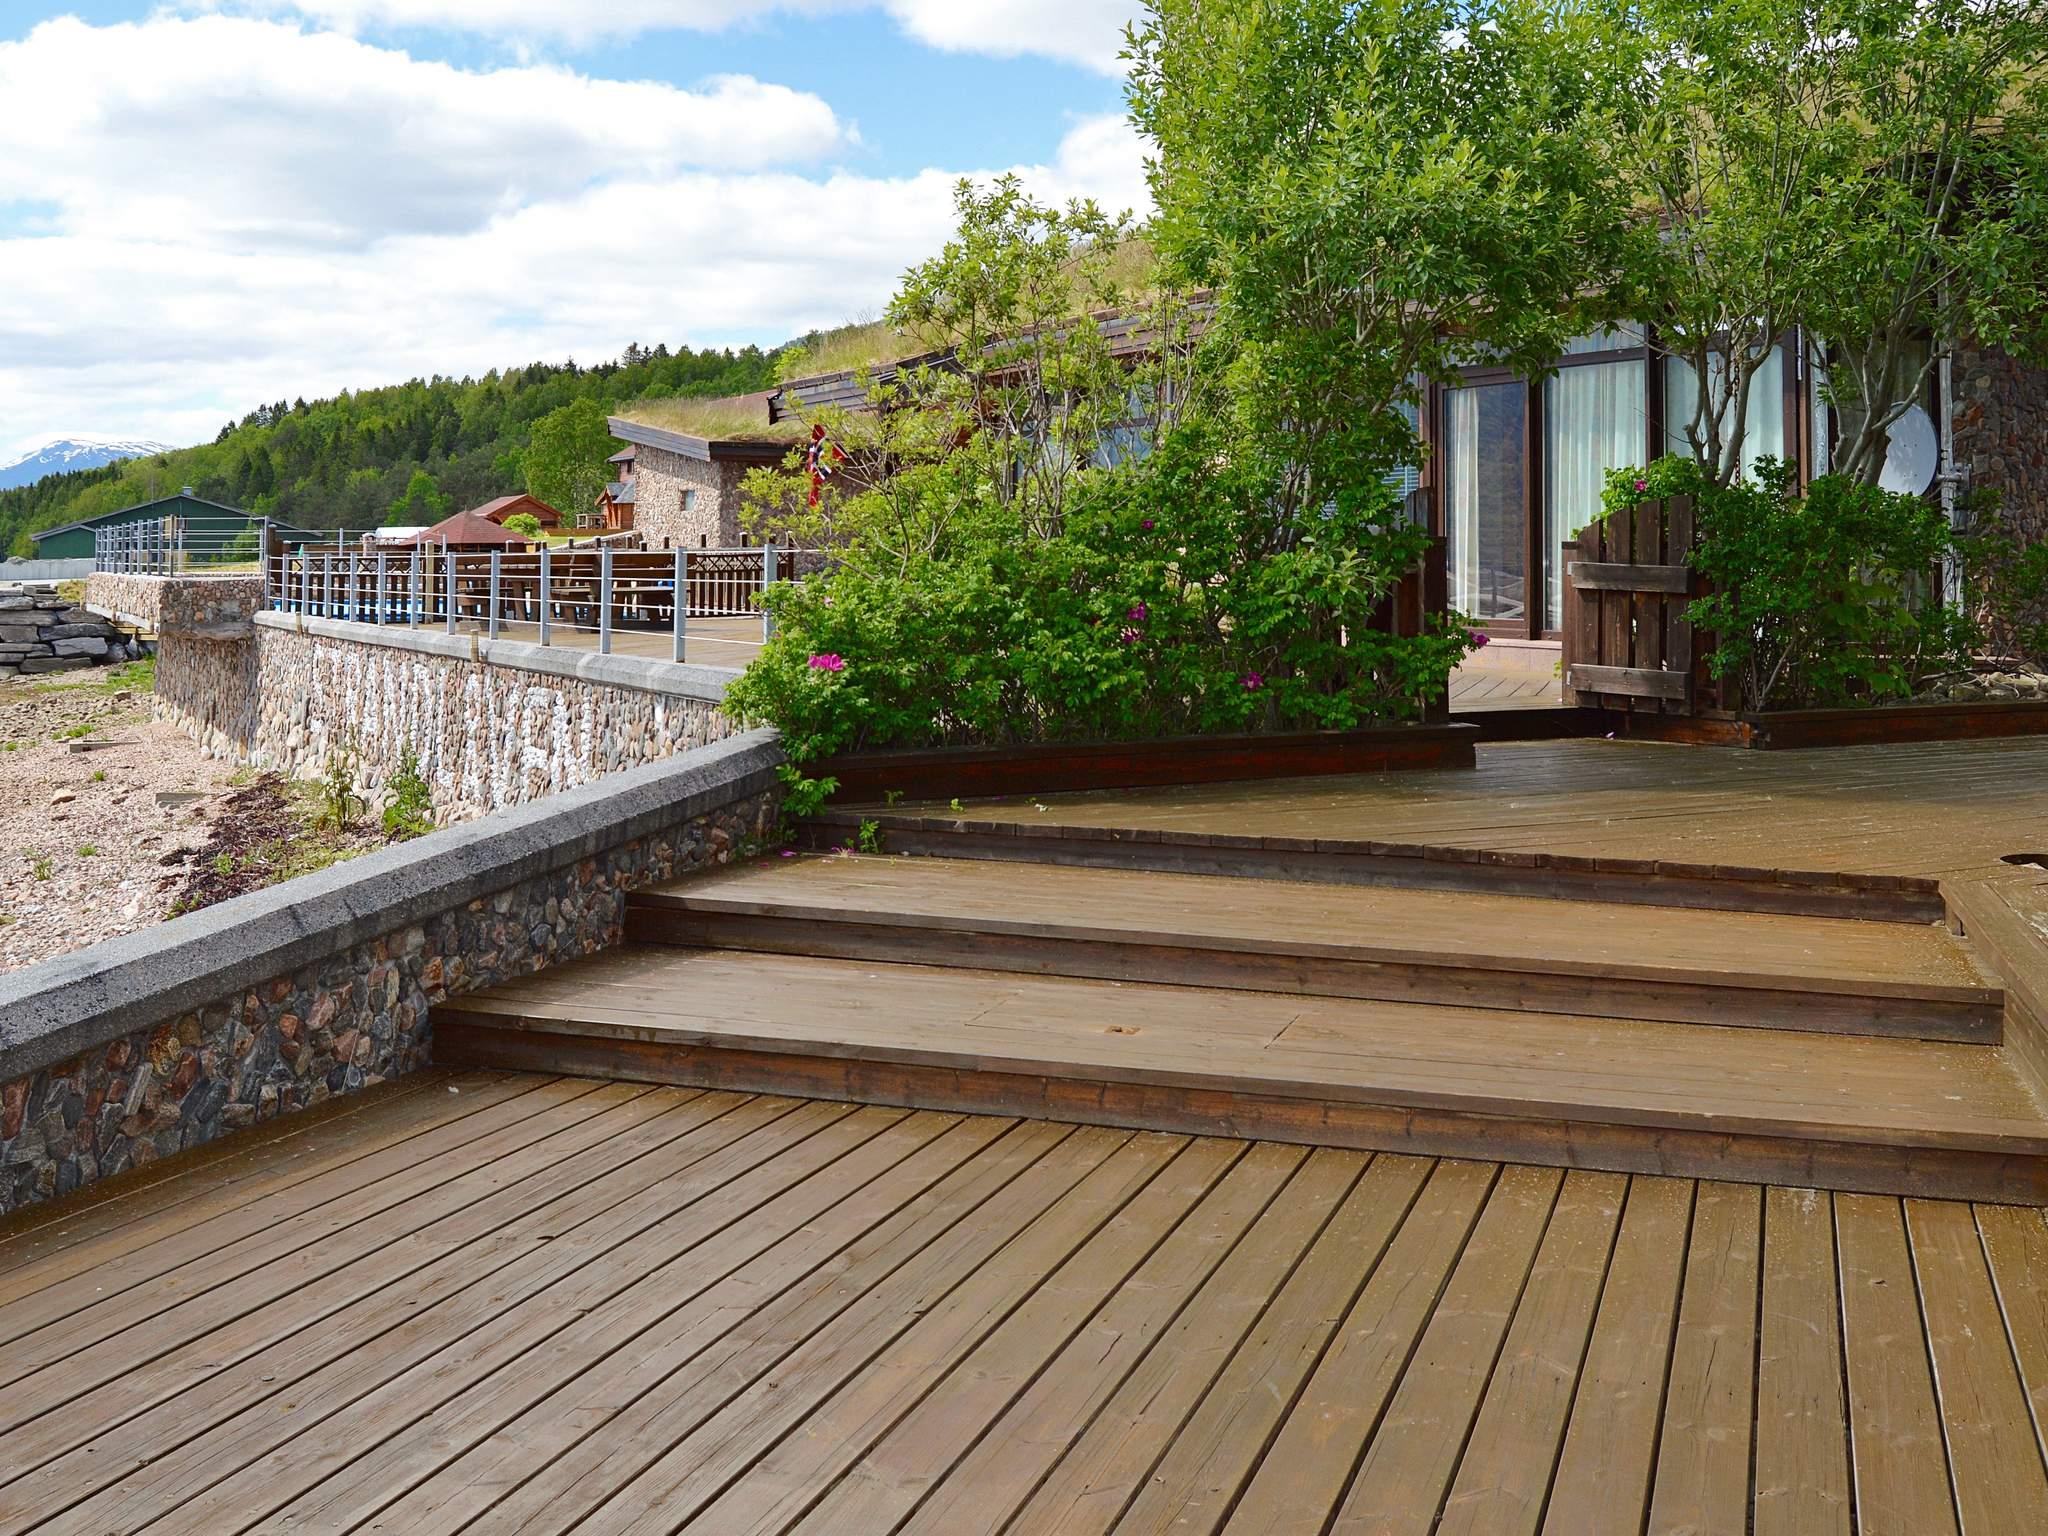 Ferienhaus Eidsvåg (84695), Eidsvåg, More - Romsdal, Westnorwegen, Norwegen, Bild 23